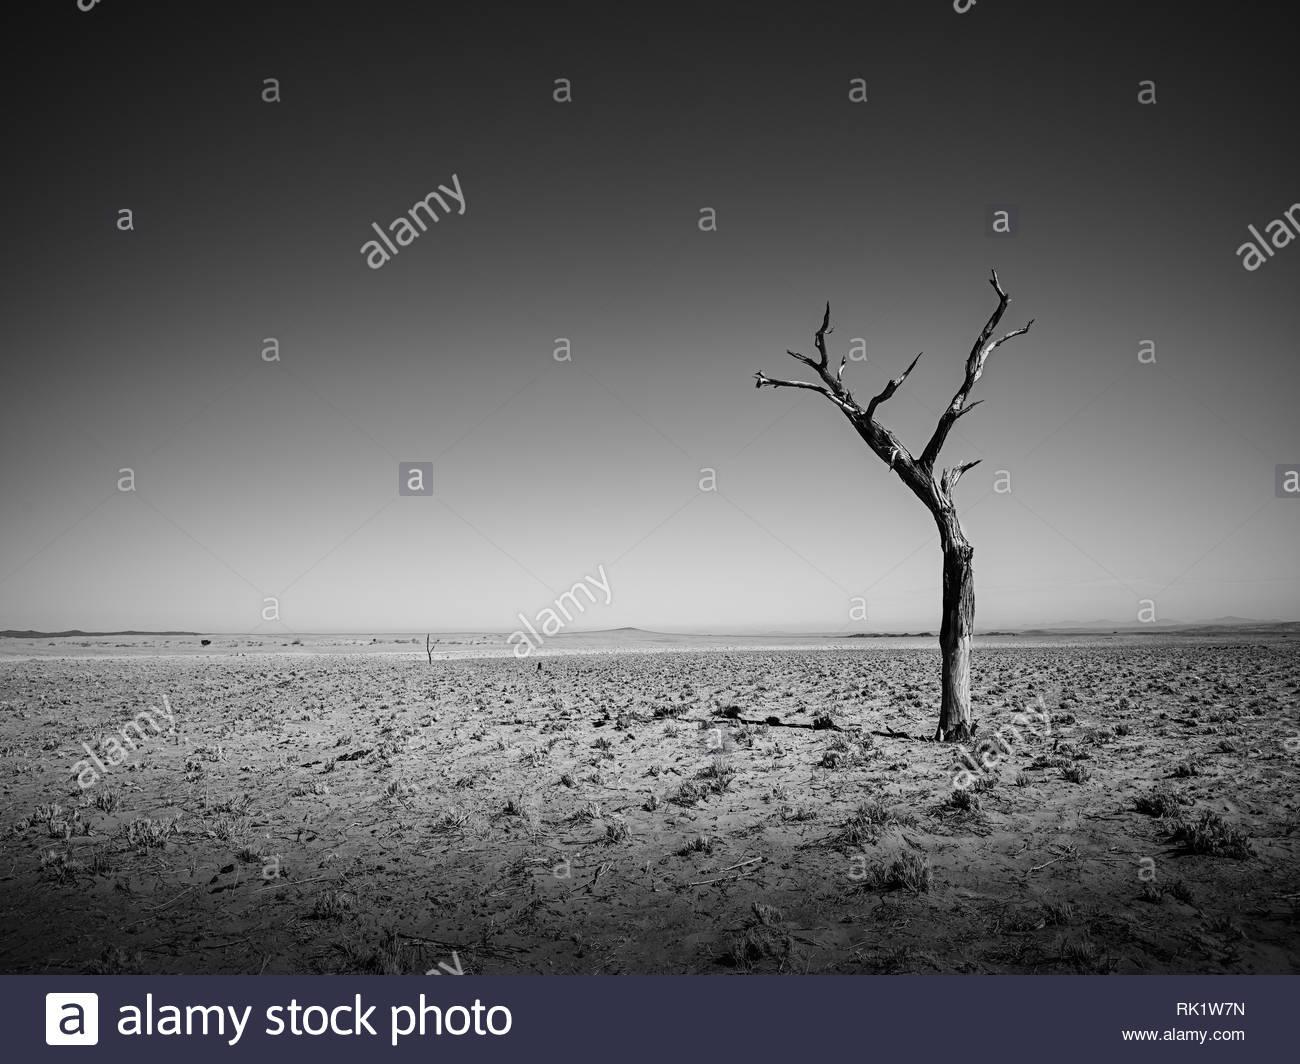 tree alone in the desert - Stock Image